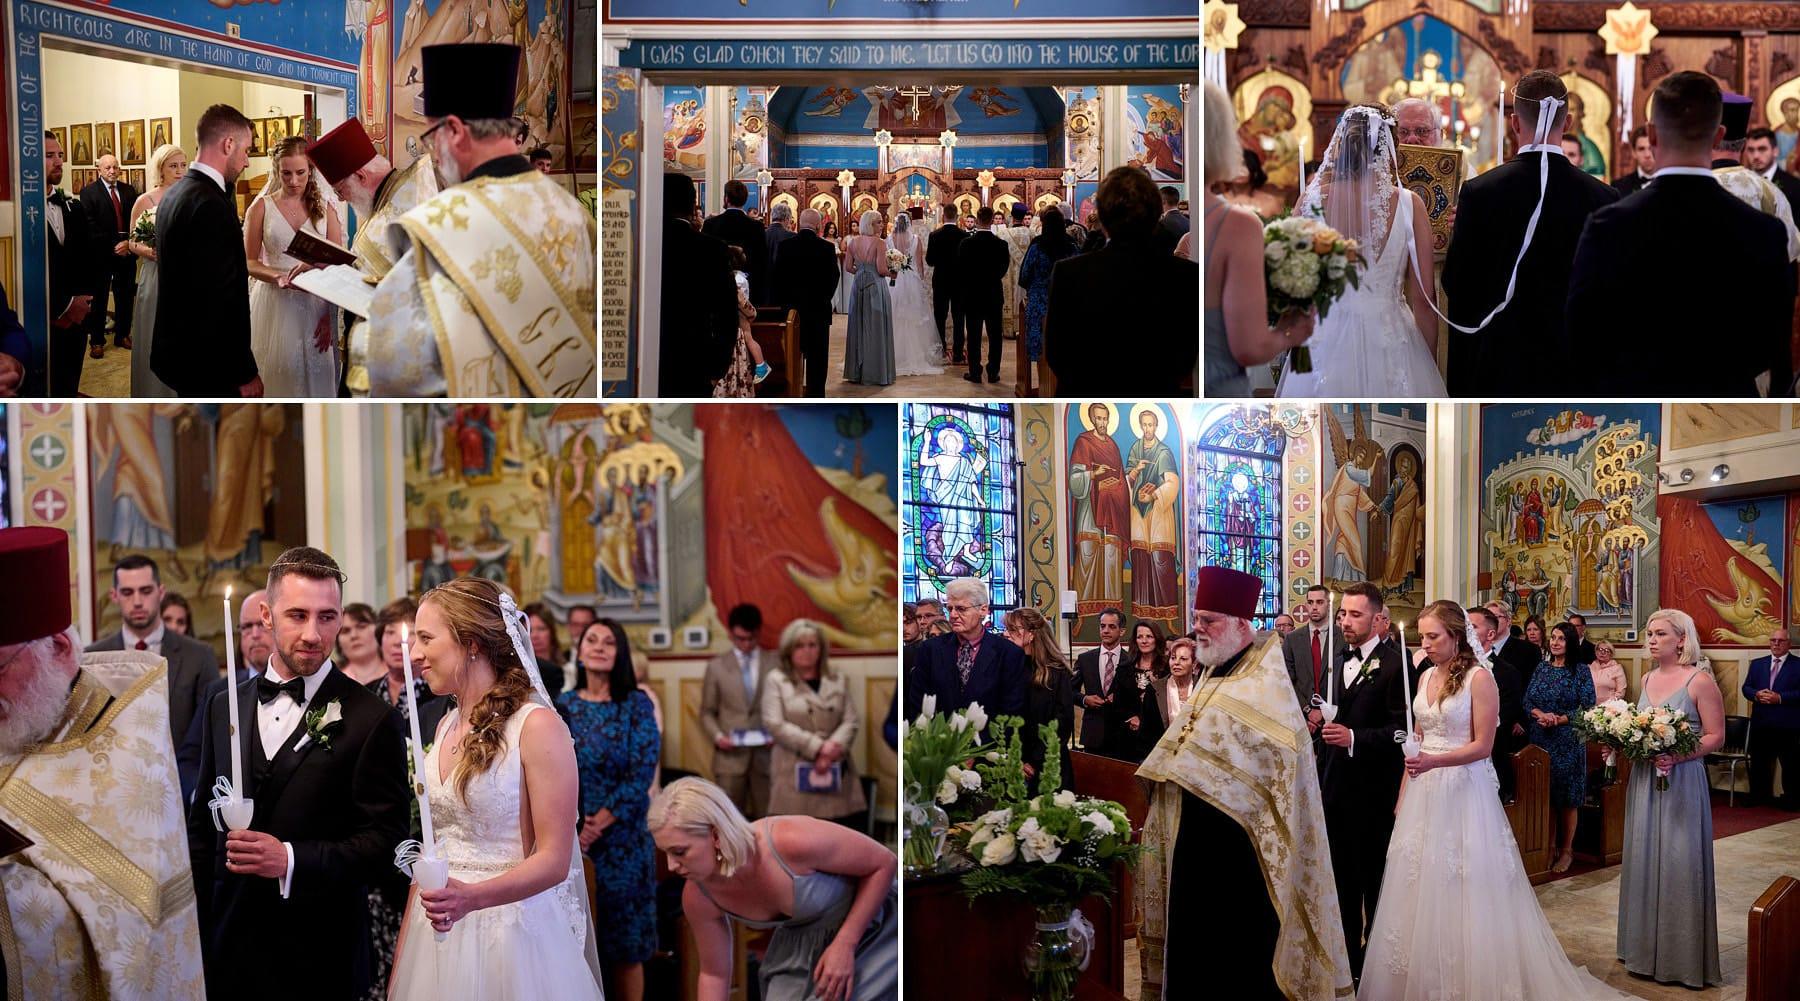 orthodox wedding ceremony photo